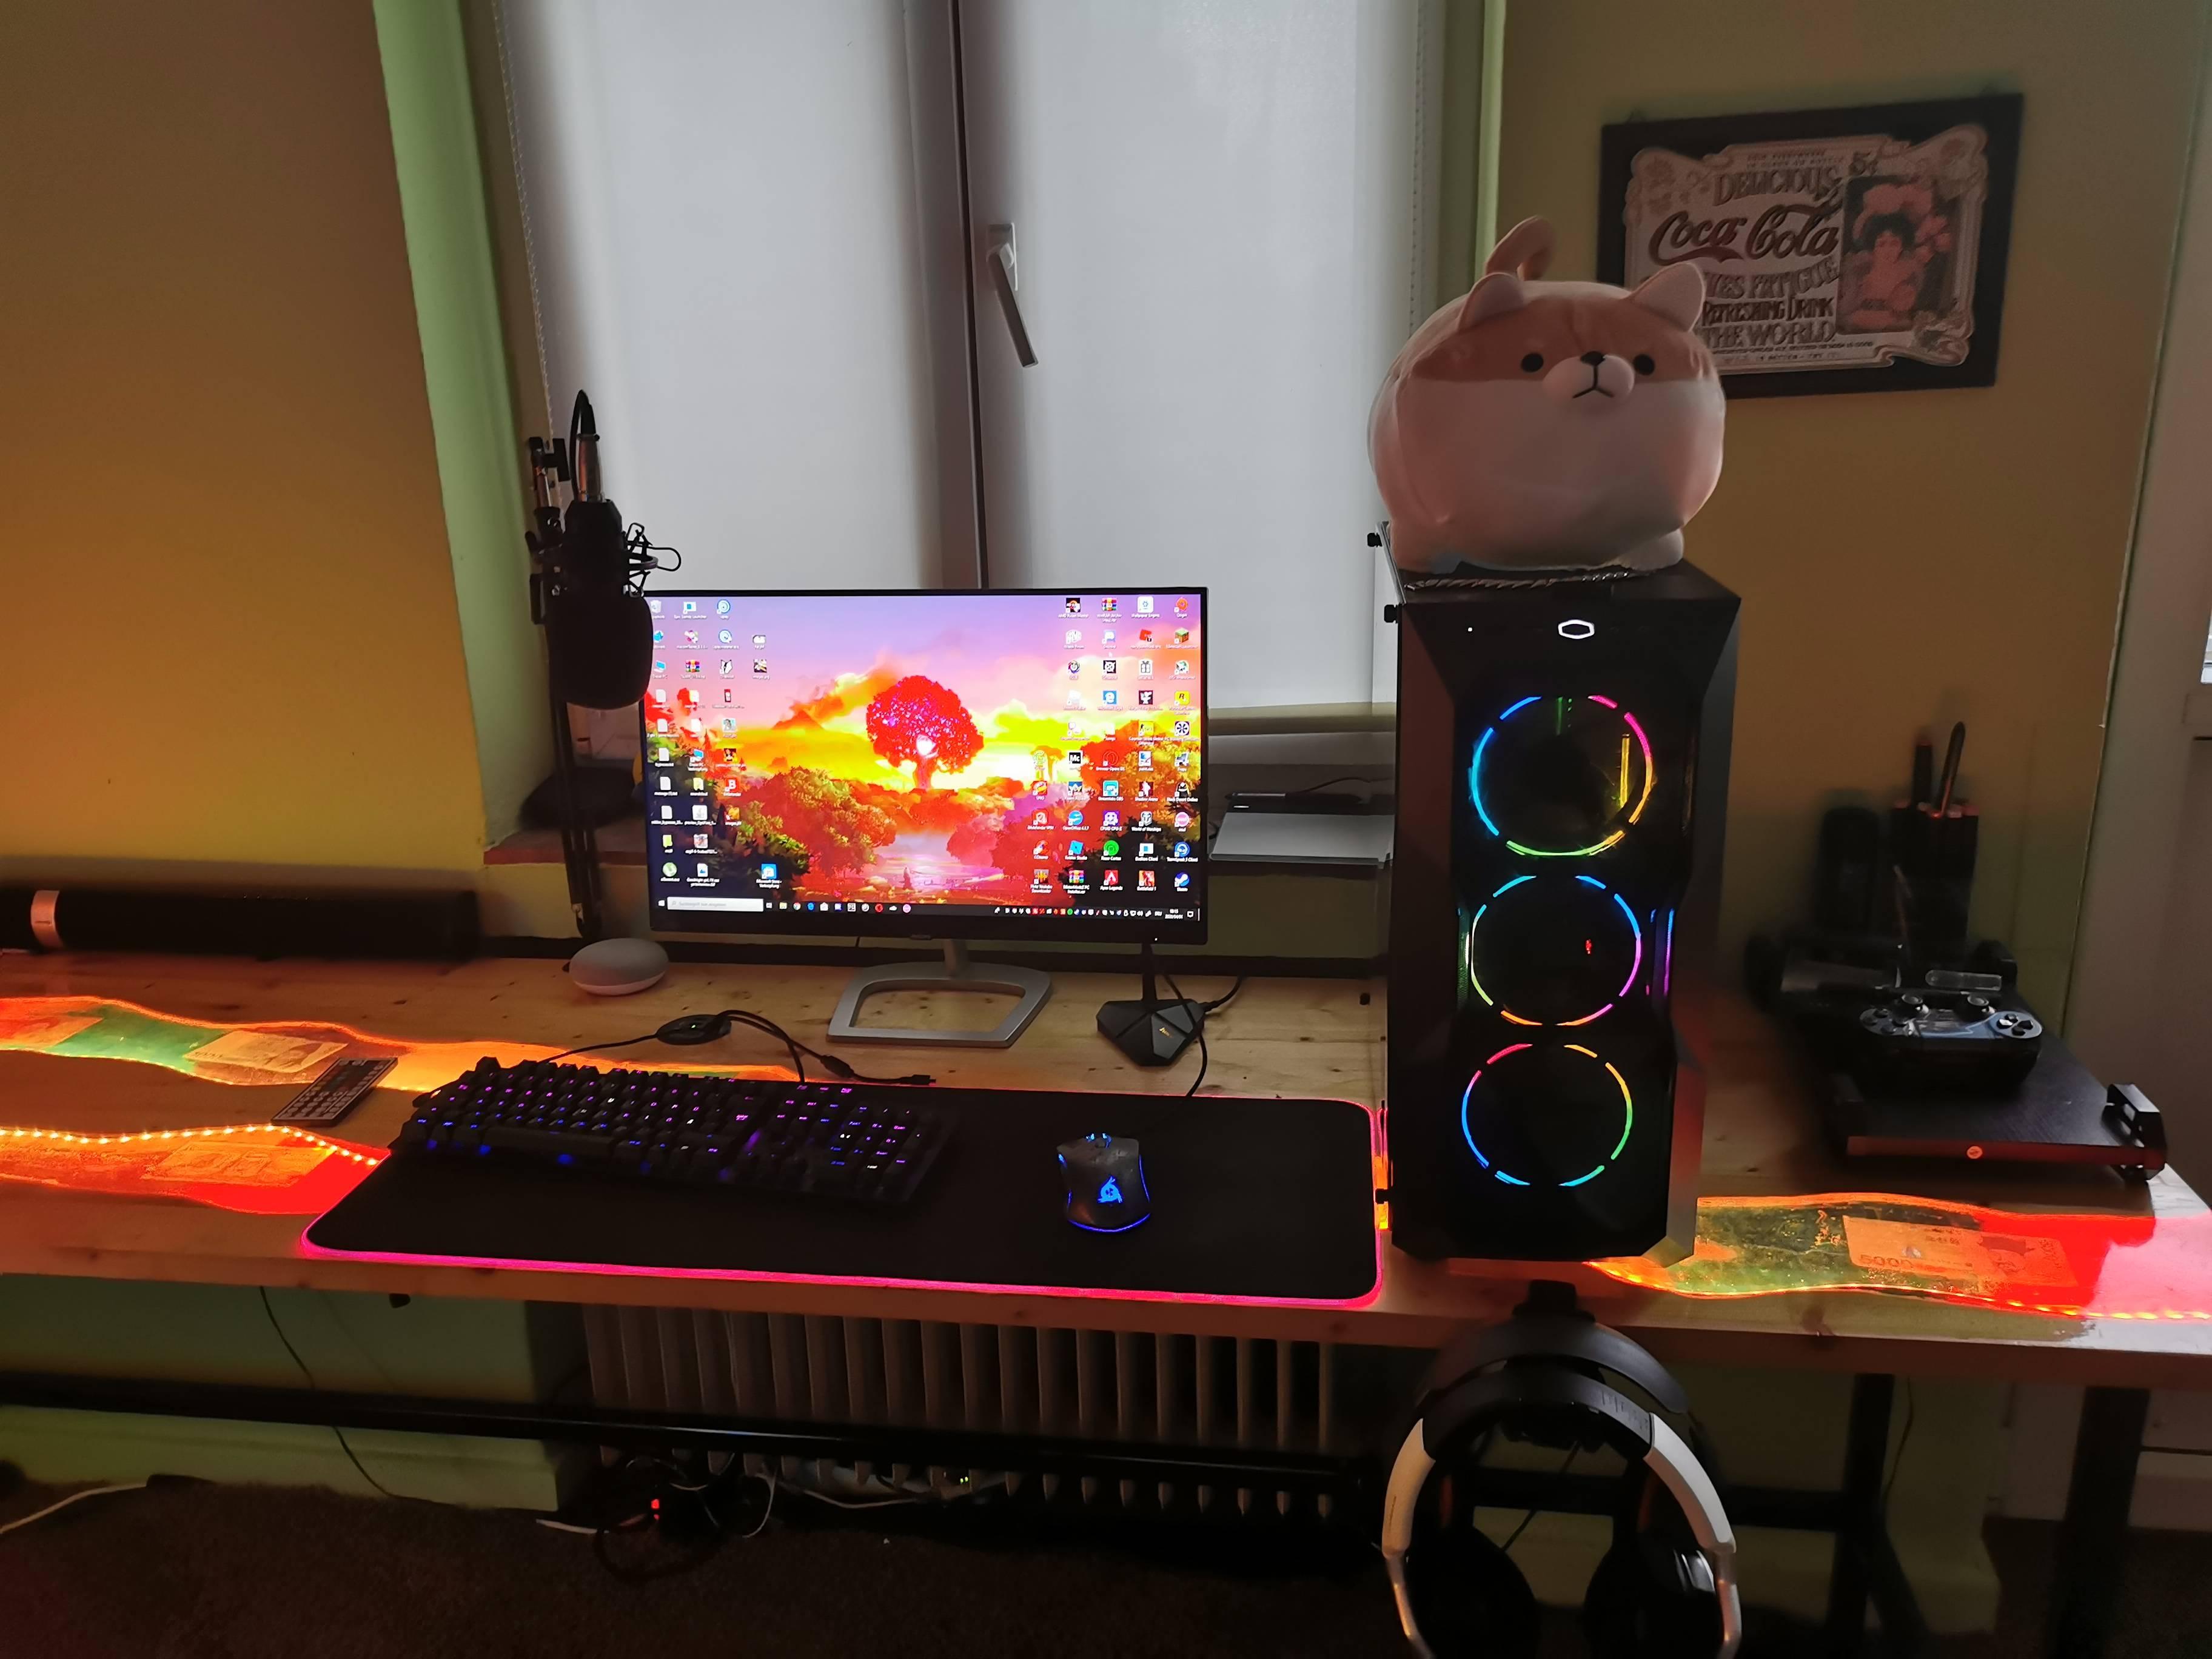 stunter443's Setup - My gaming setup  | Scooget